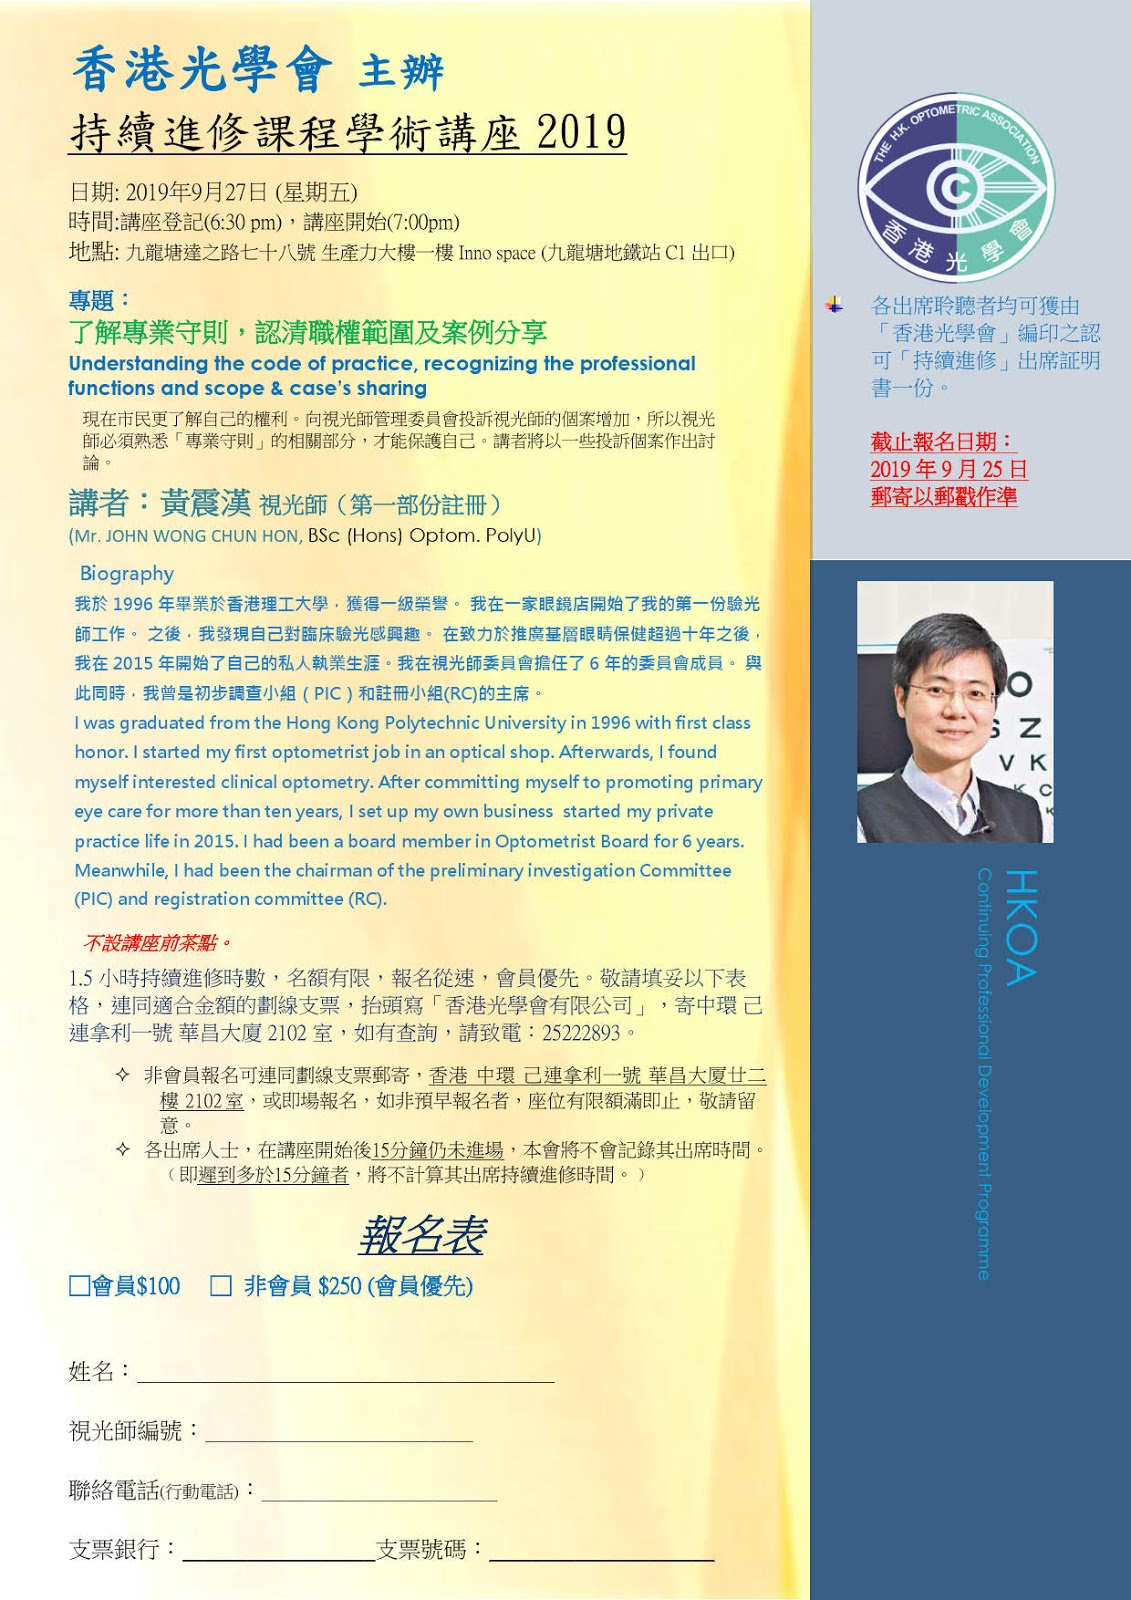 HKOA BLOG: 持續進修課程學術講座 2019 (2019年9月27日)